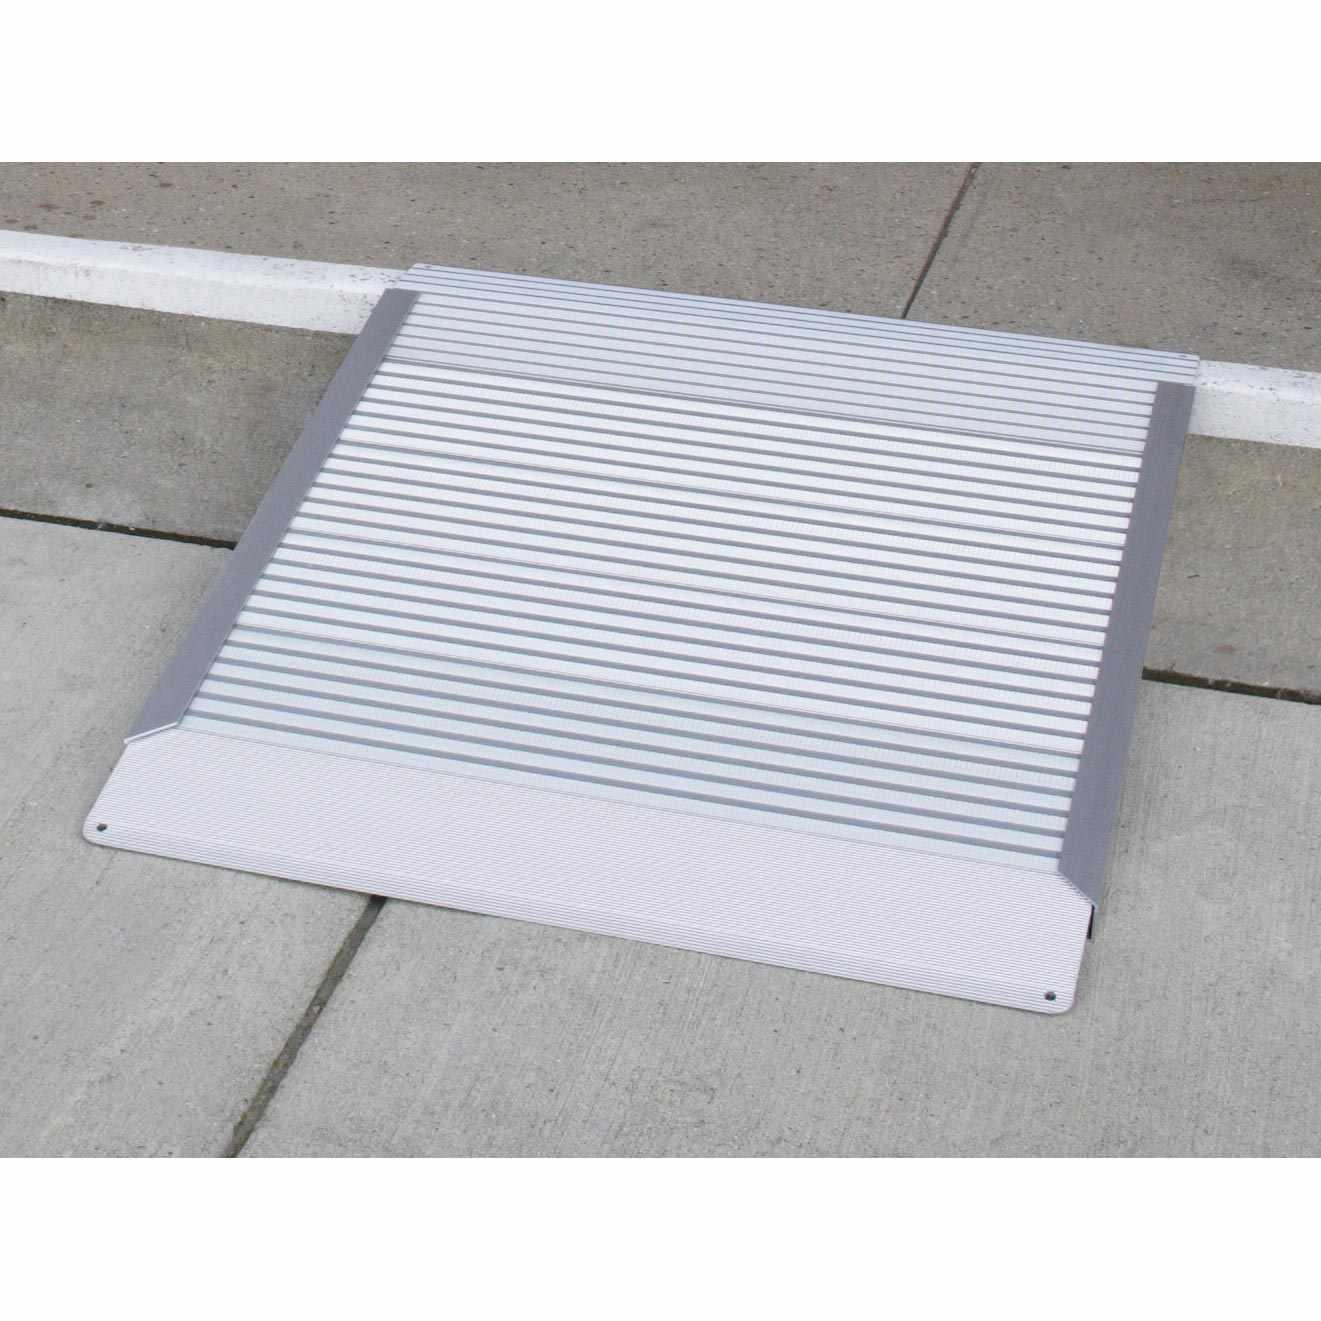 Aluminum Threshold Ramp